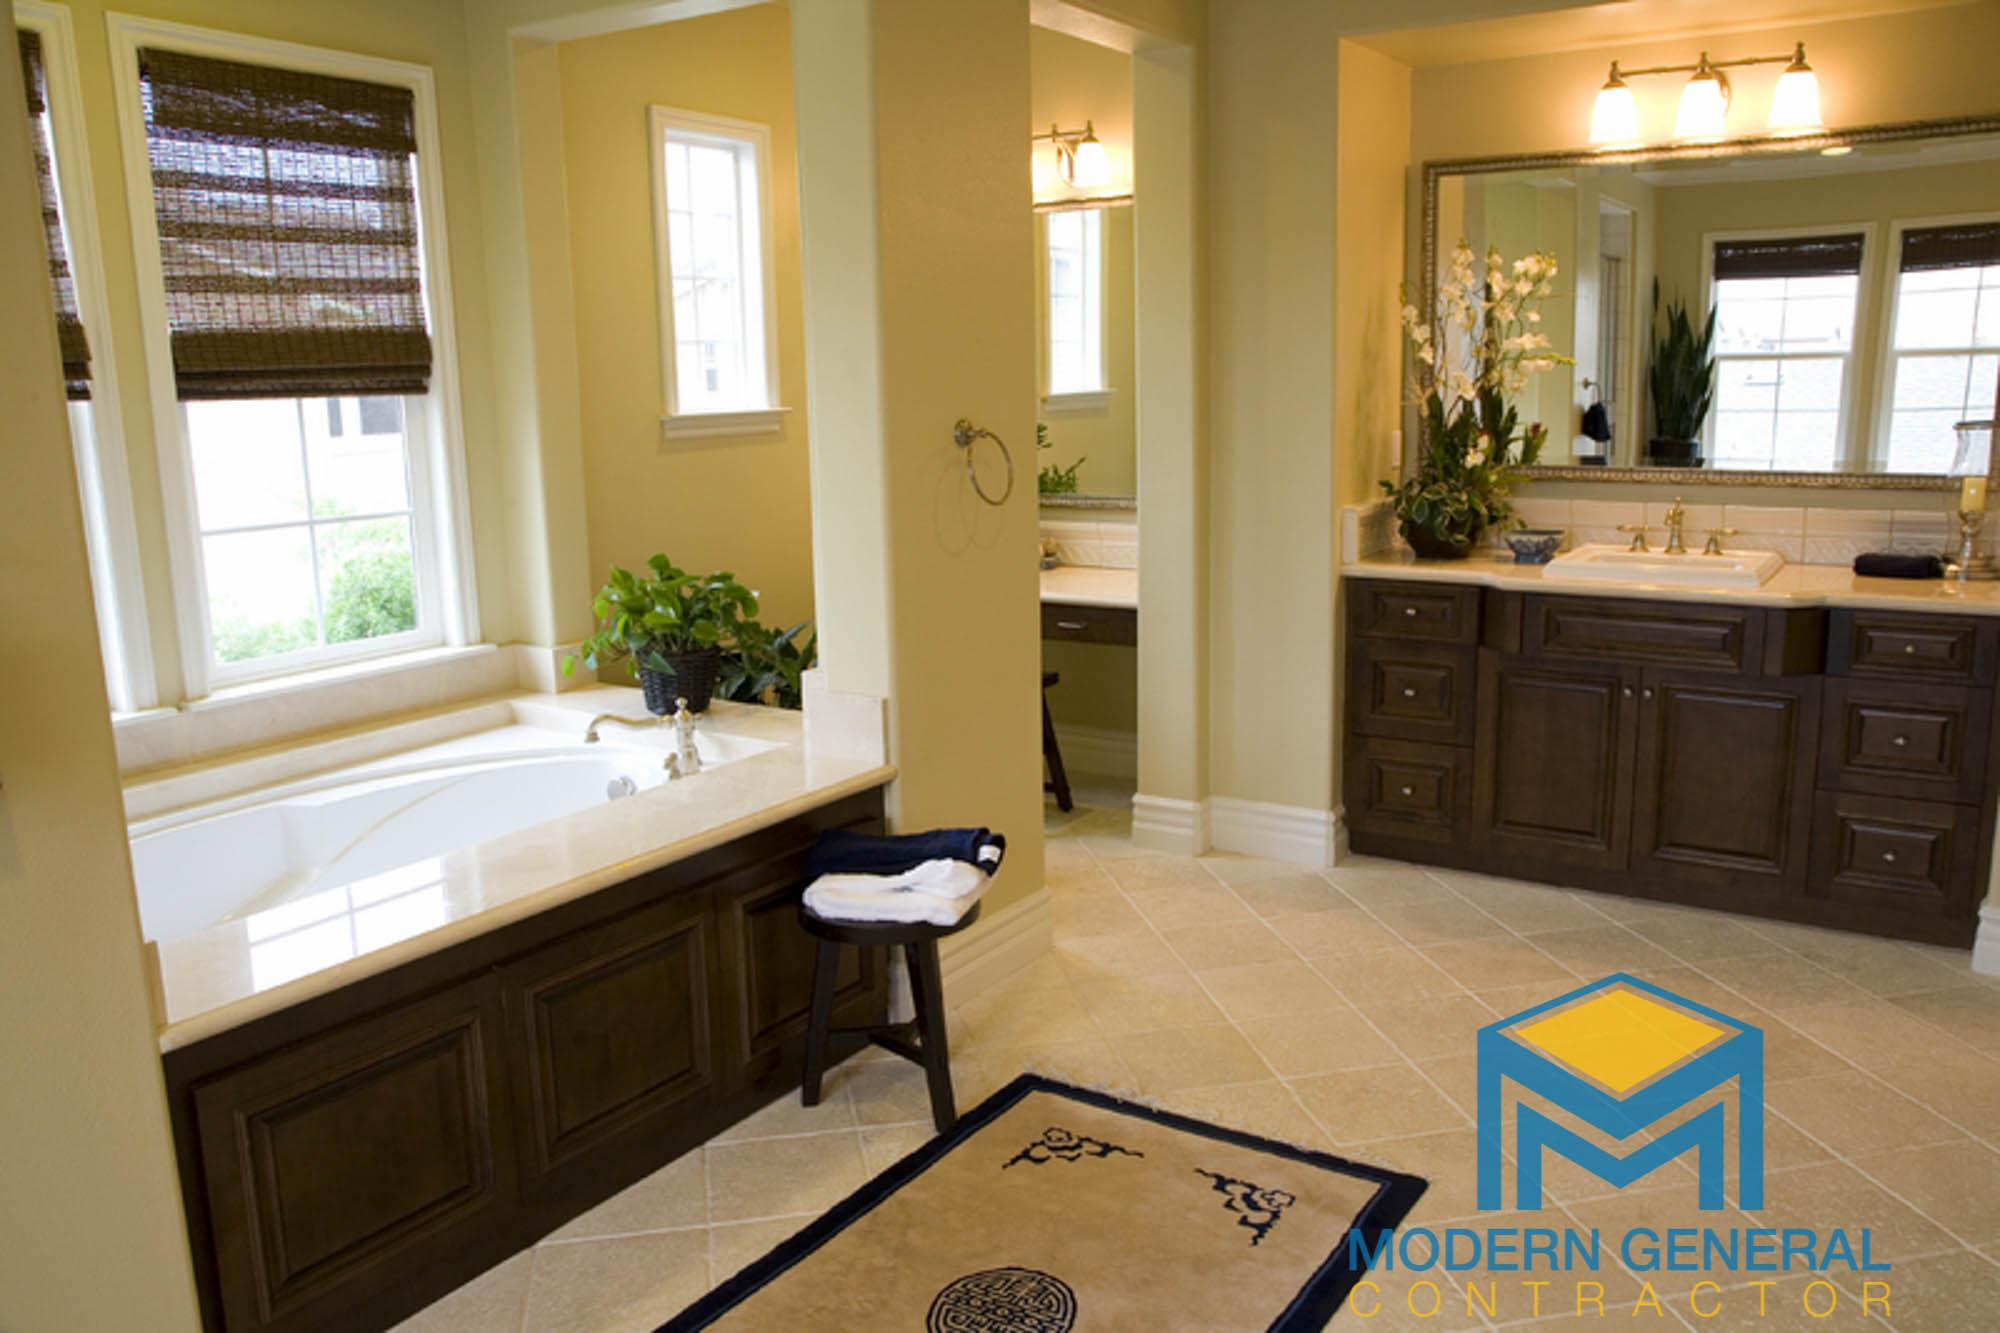 bathroom modern general contractor